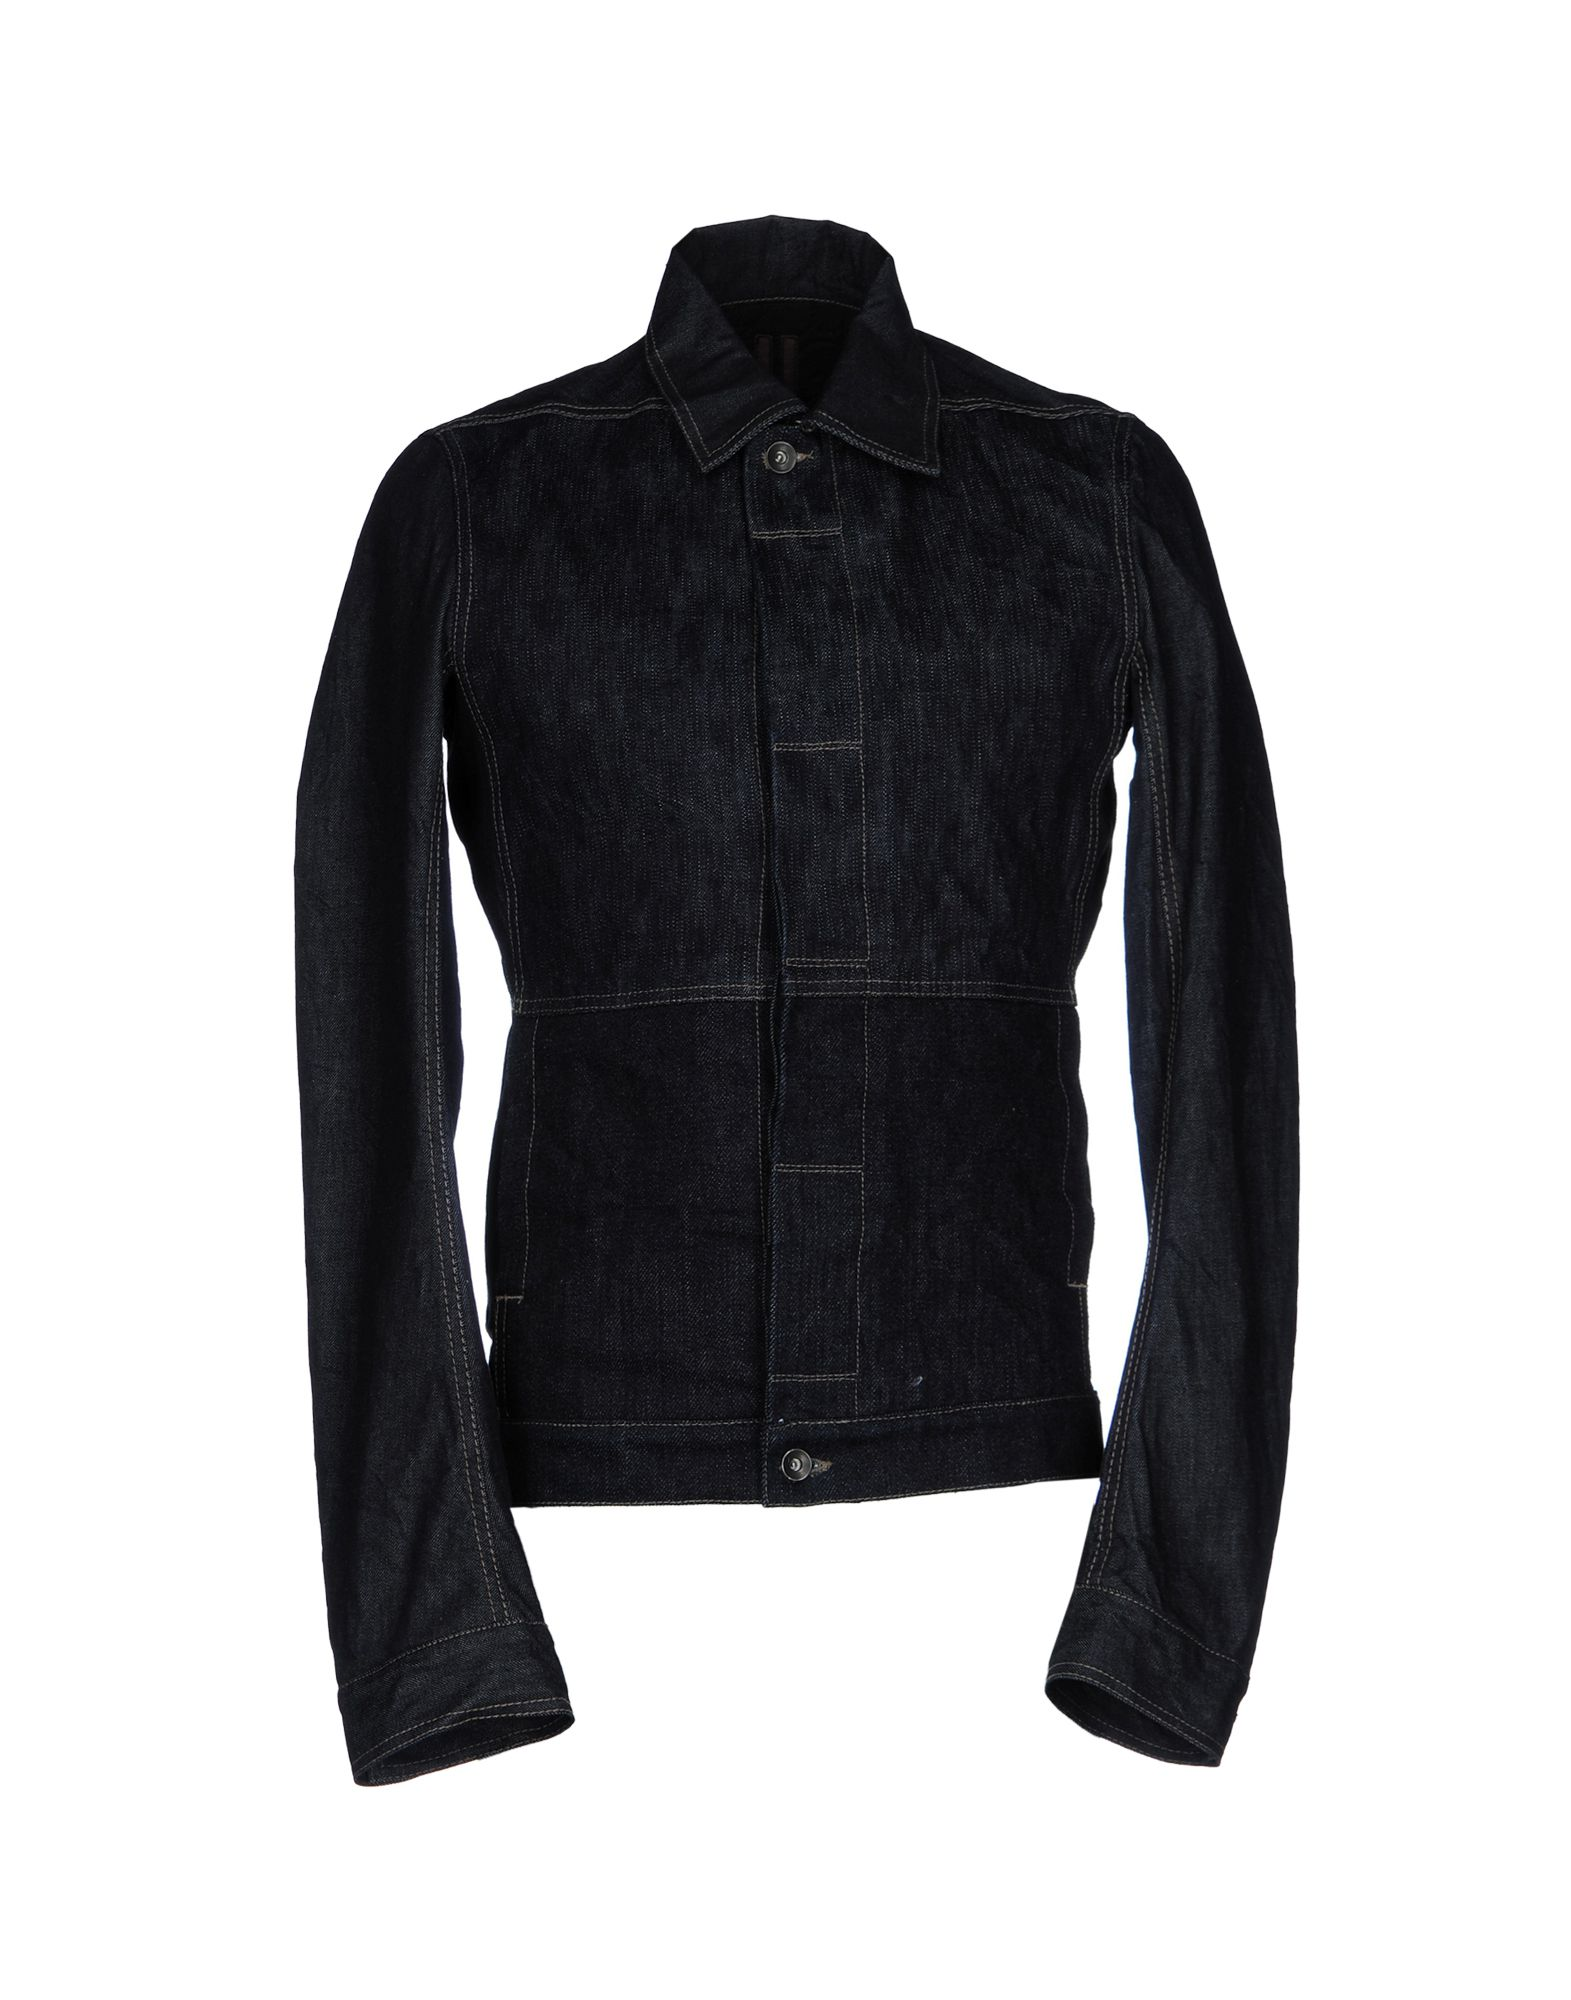 DRKSHDW by RICK OWENS Джинсовая верхняя одежда пуловер quelle rick cardona by heine 3918